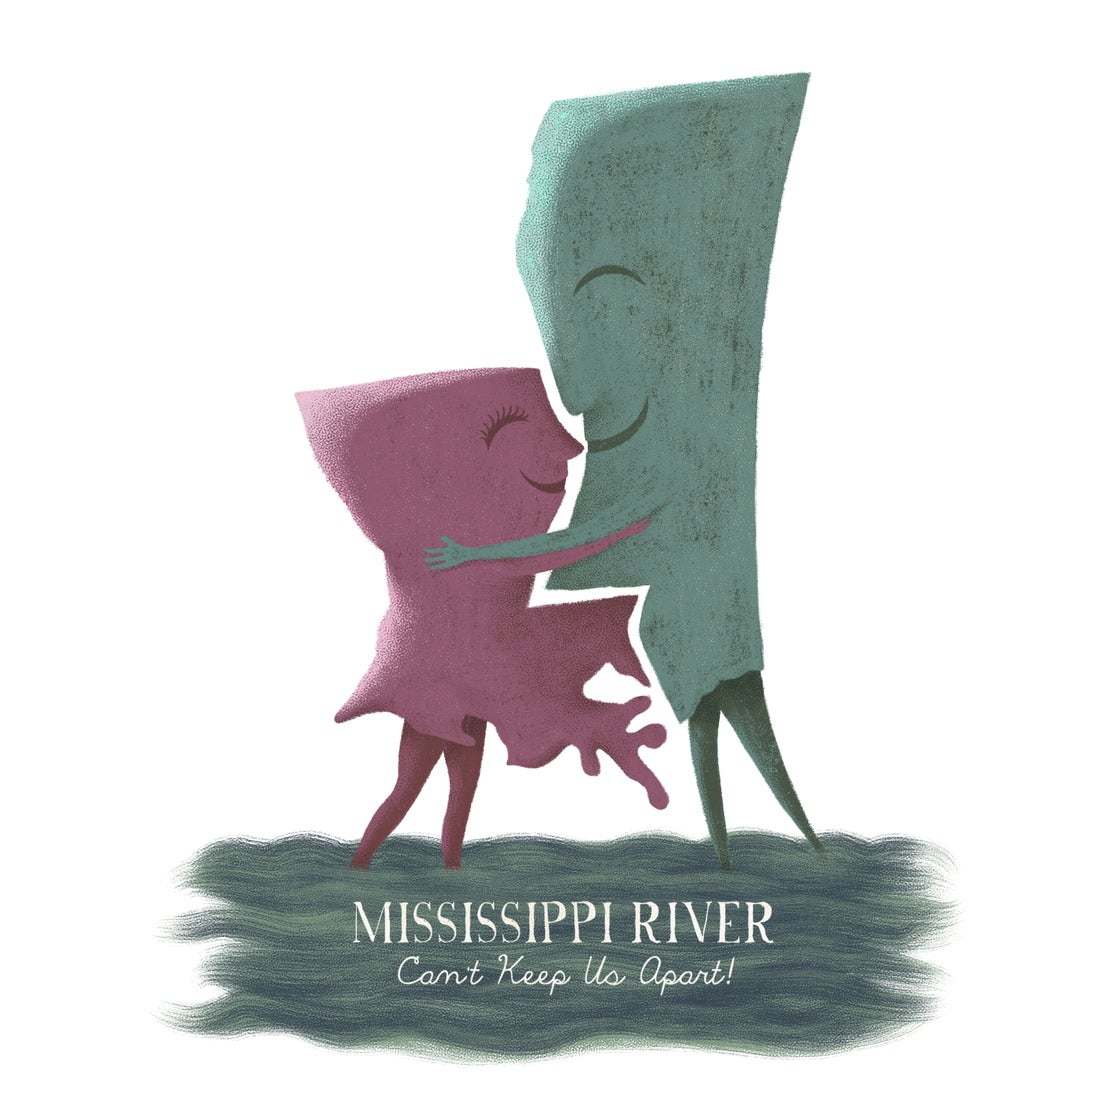 Image of Louisiana Woman, Mississippi Man